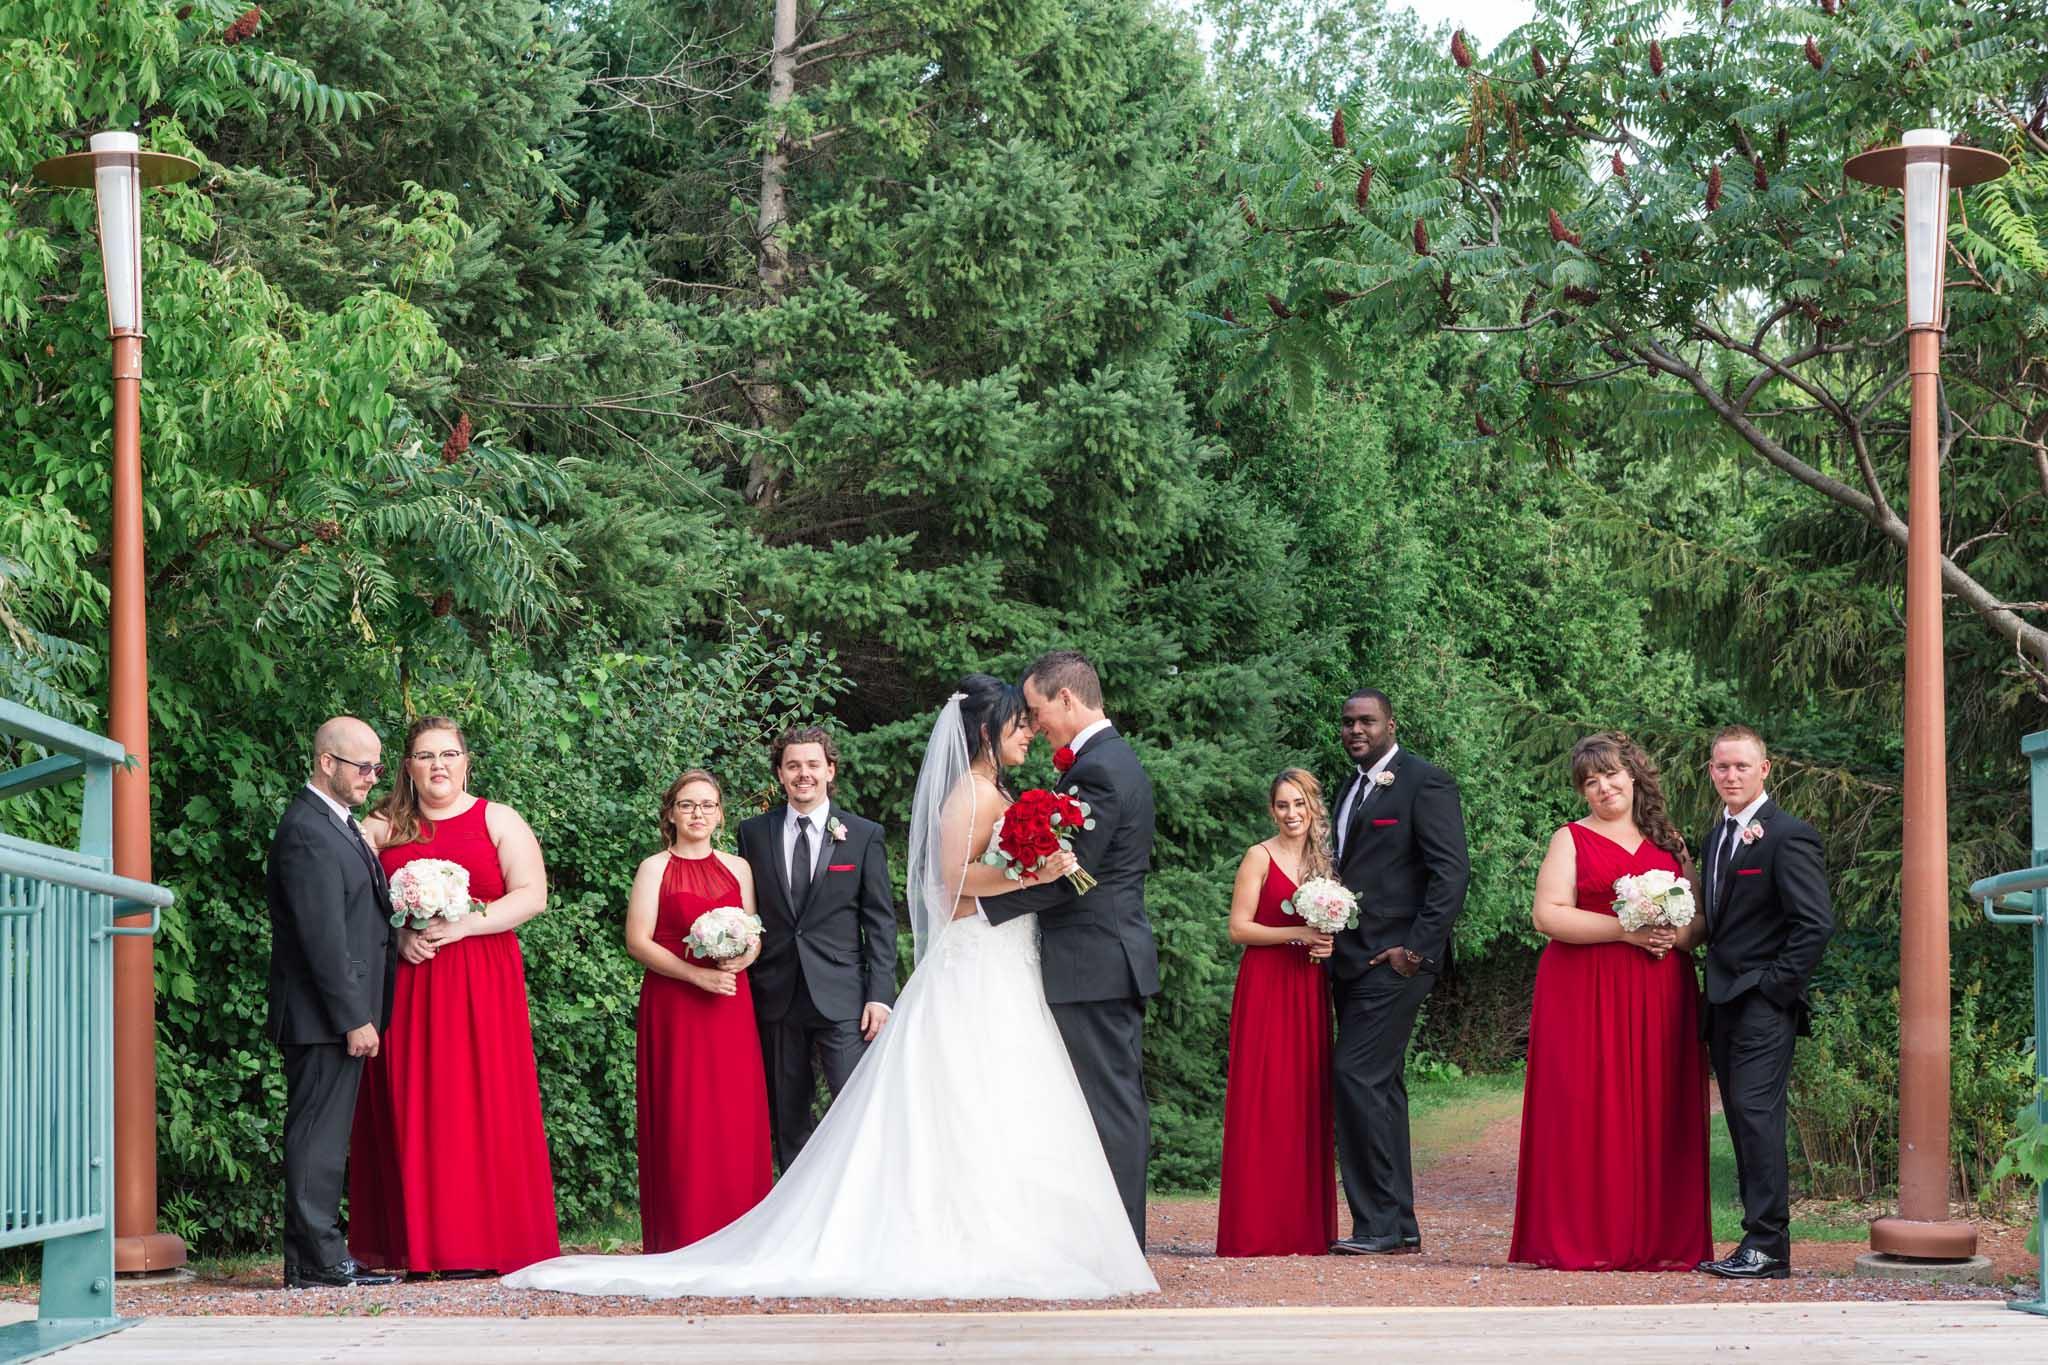 Hilton Wedding Photographer-1707.JPG